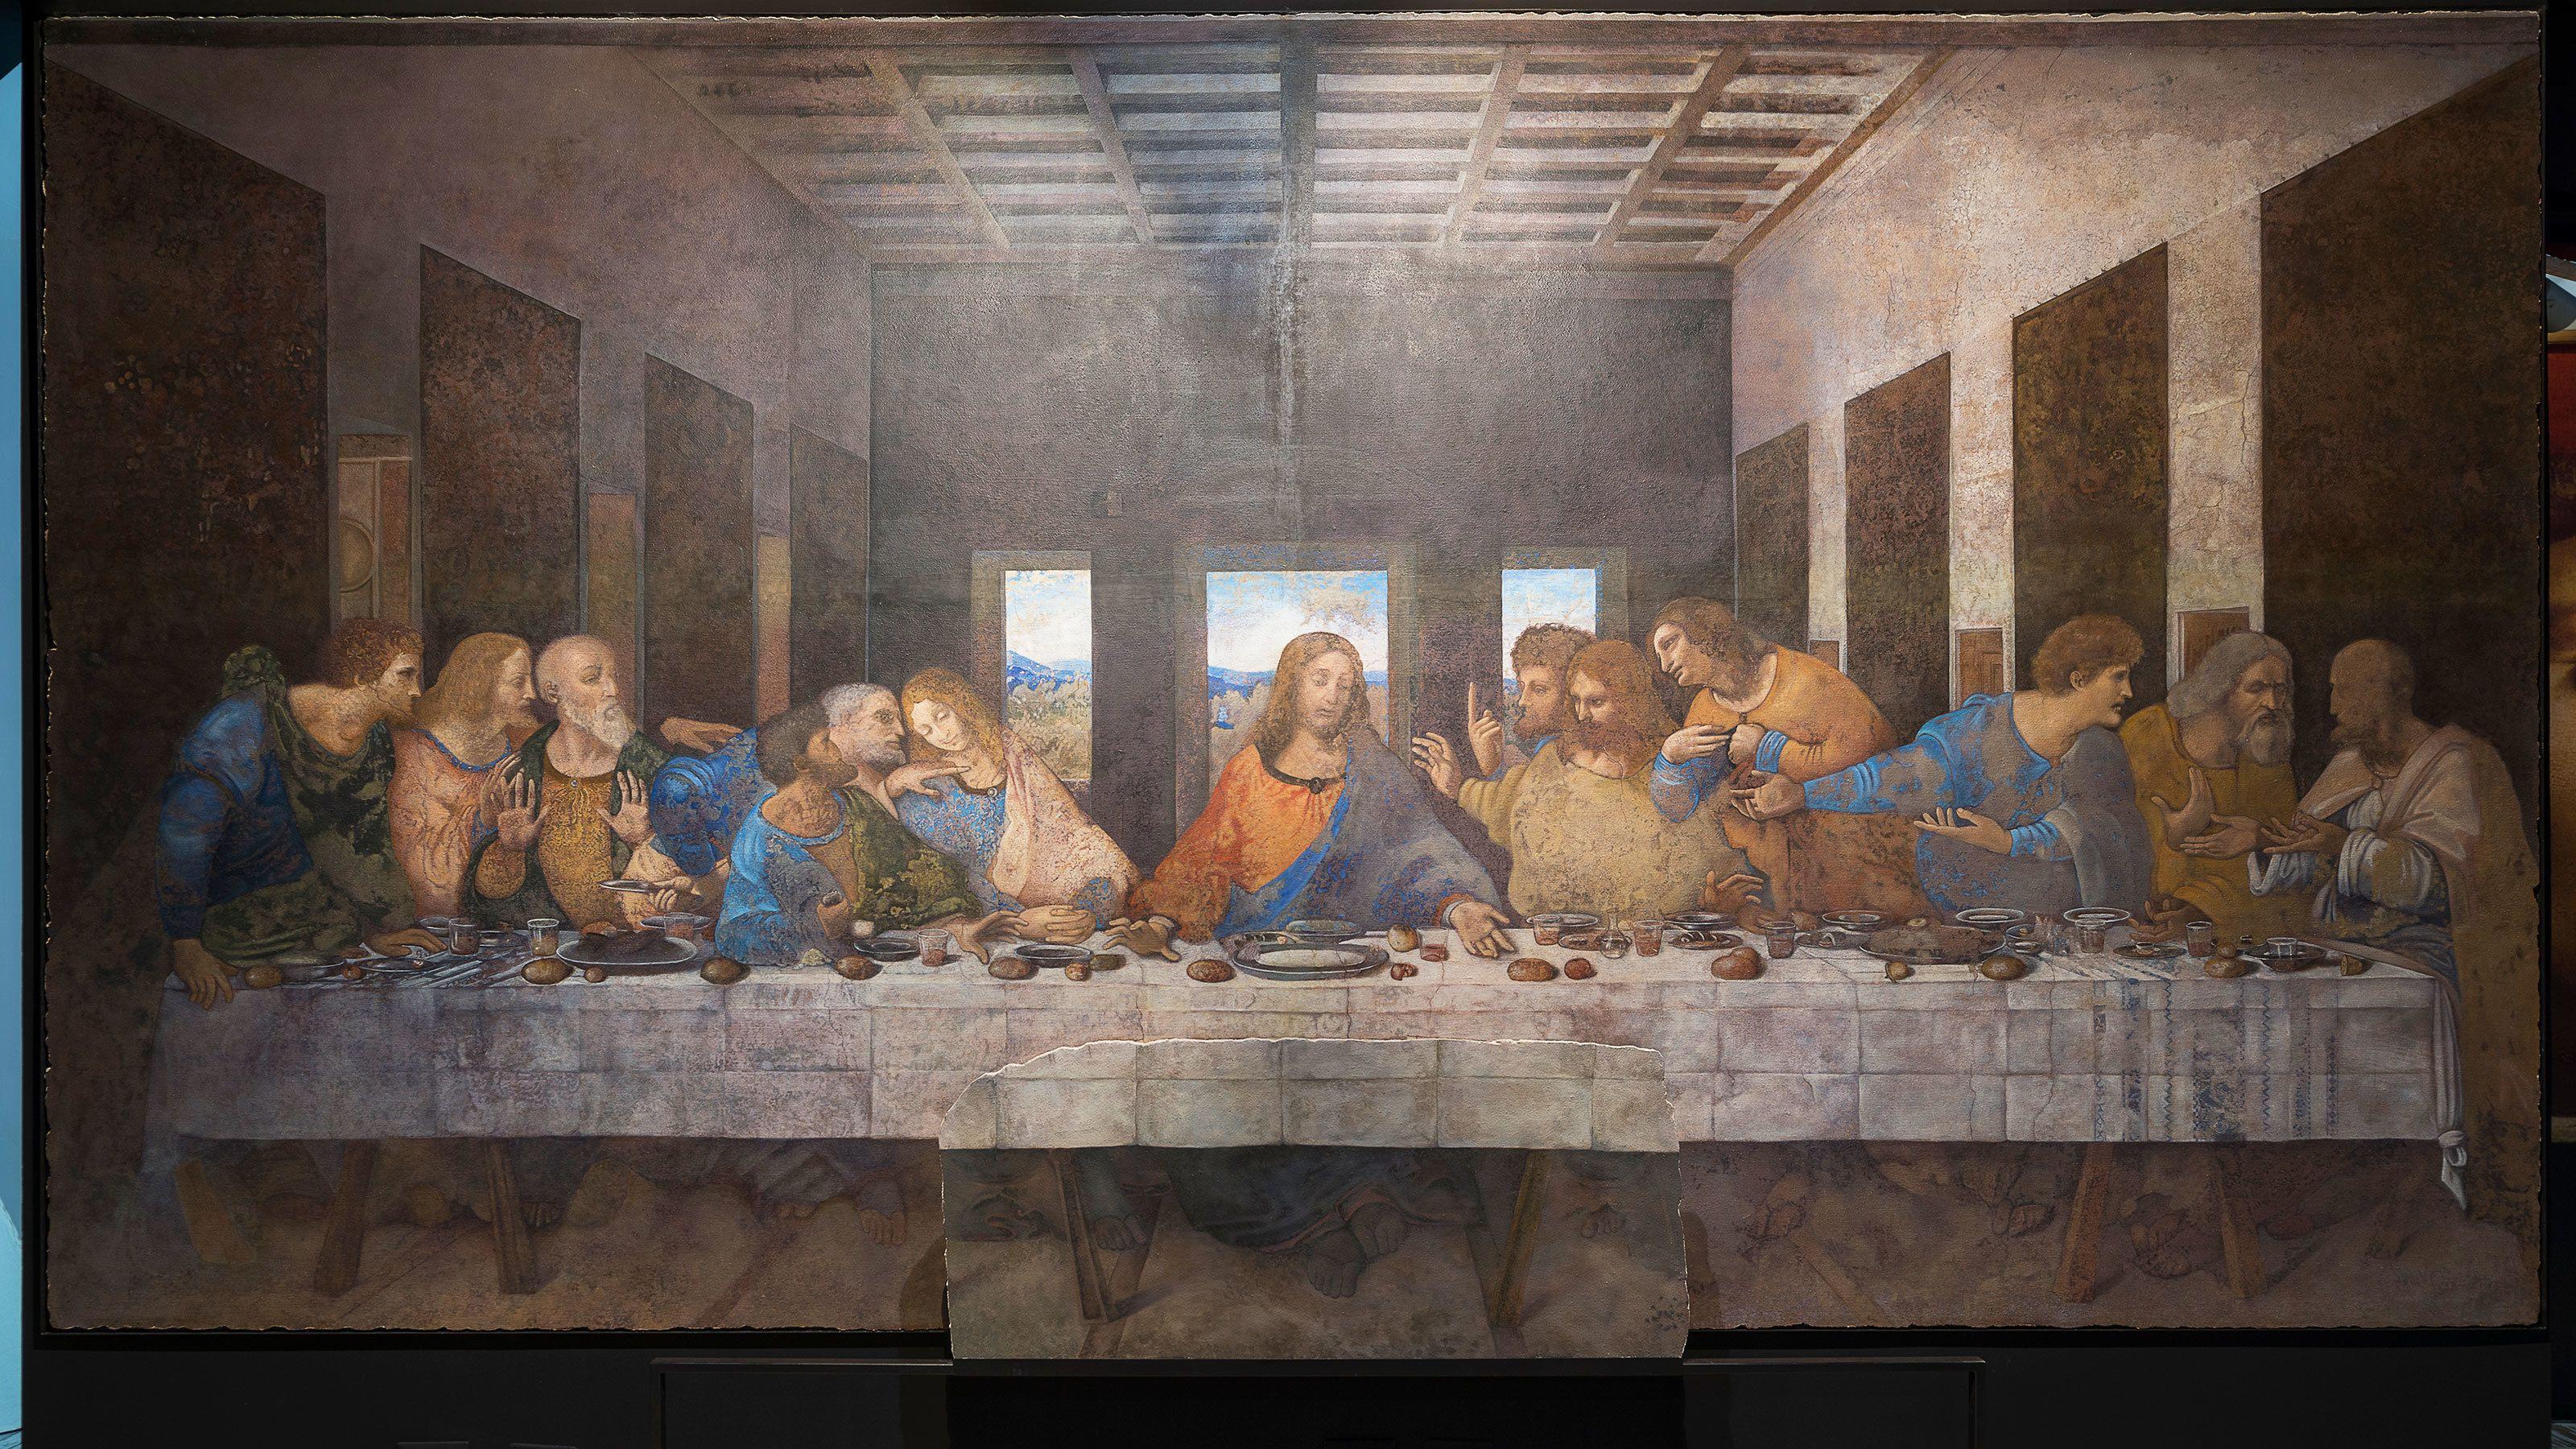 Skip-the-Line Vatican Museums Tour with Leonardo Da Vinci Experience